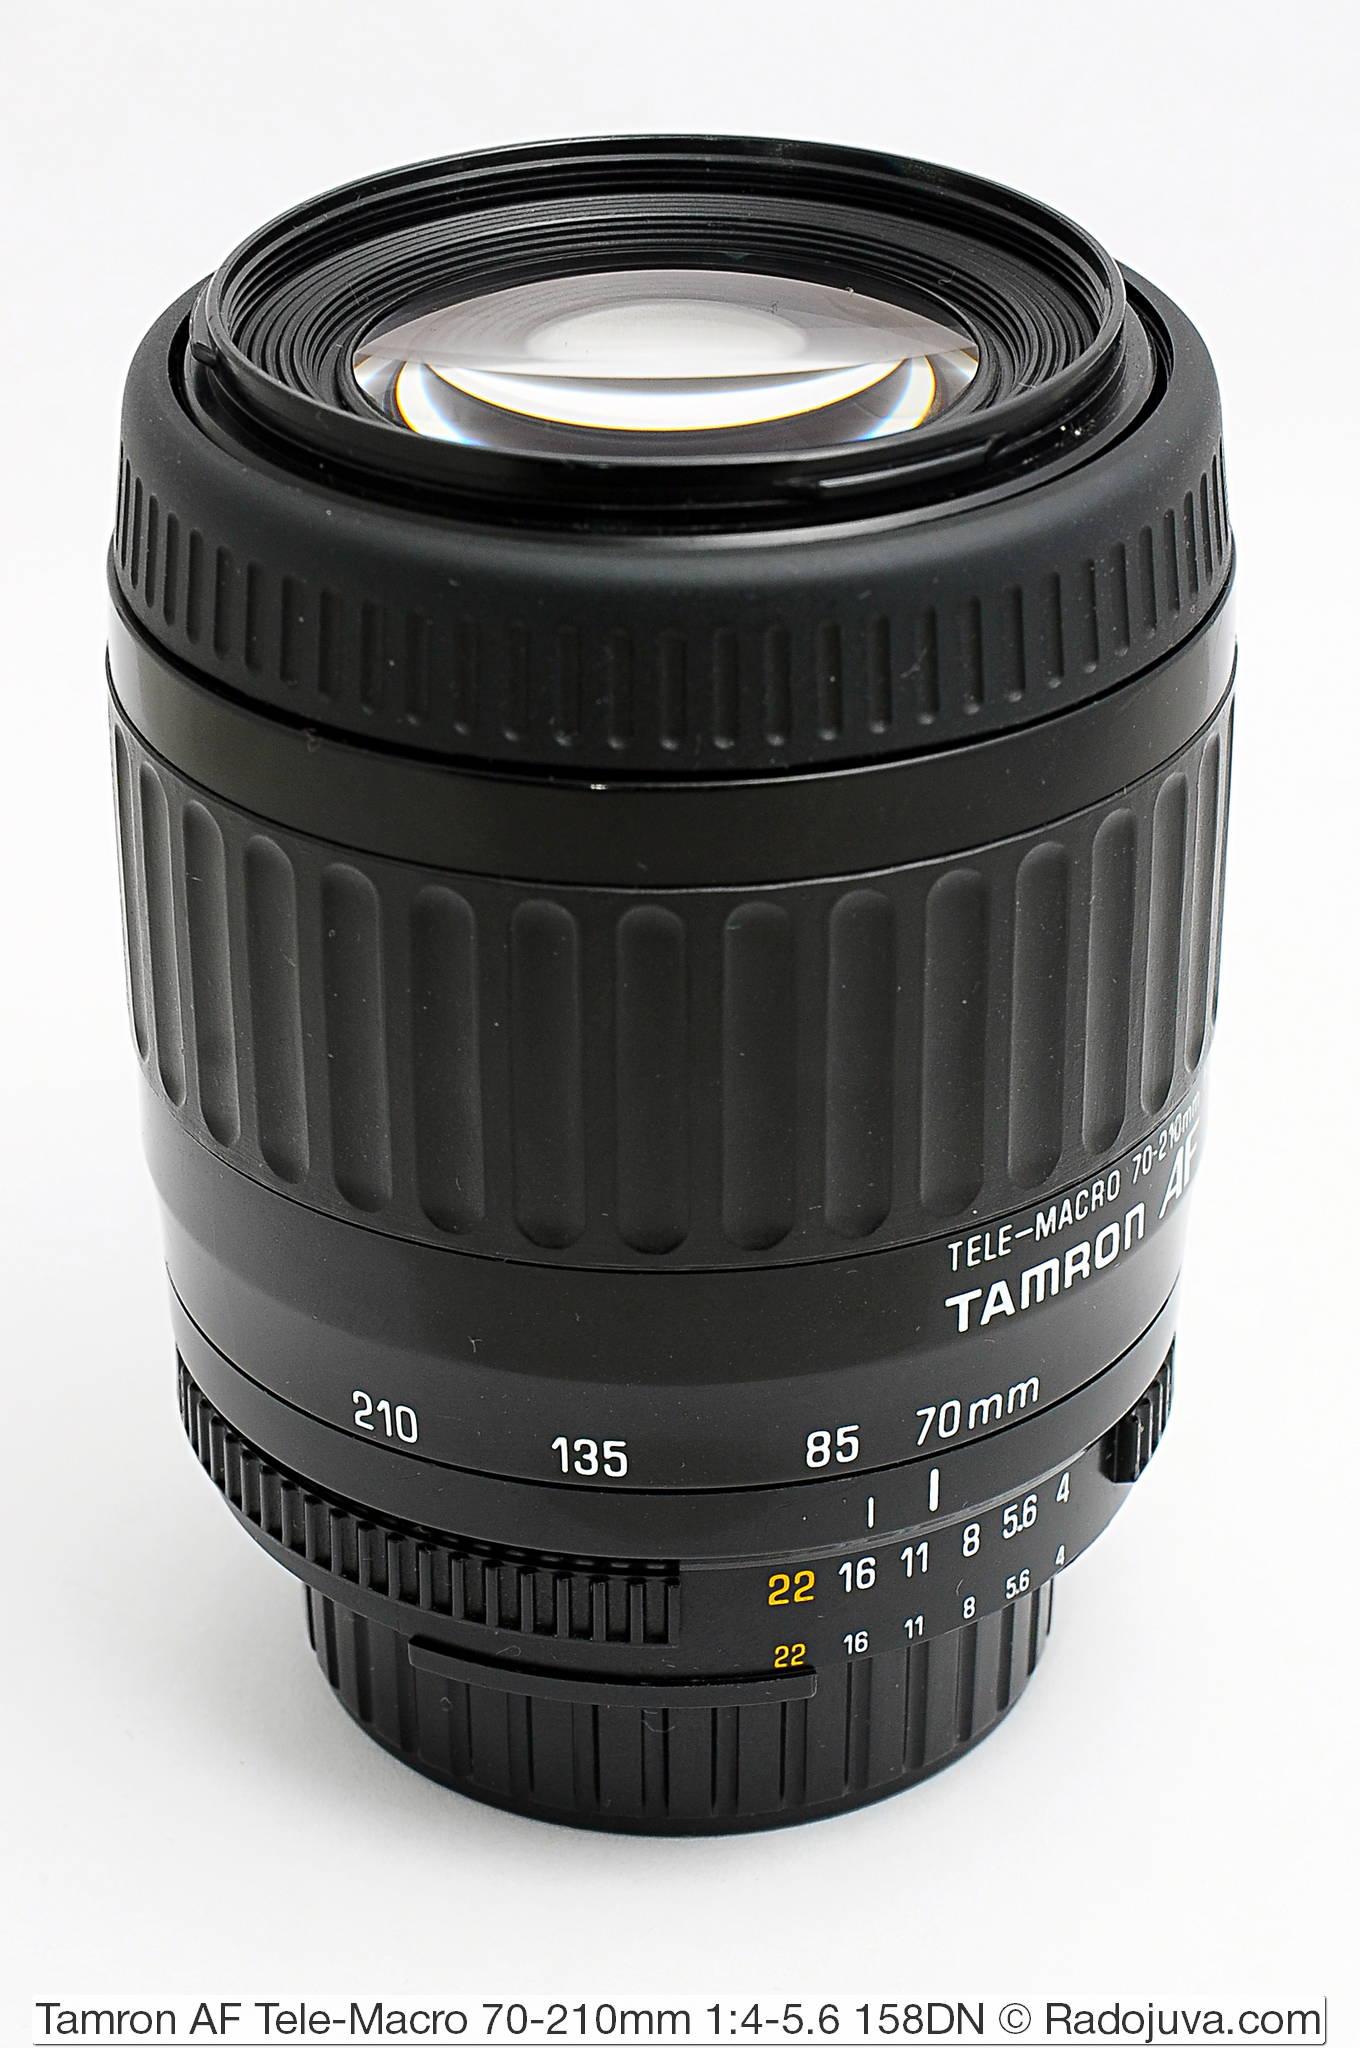 Tamron AF Tele-Macro 70-210mm 1:4-5.6 158DN